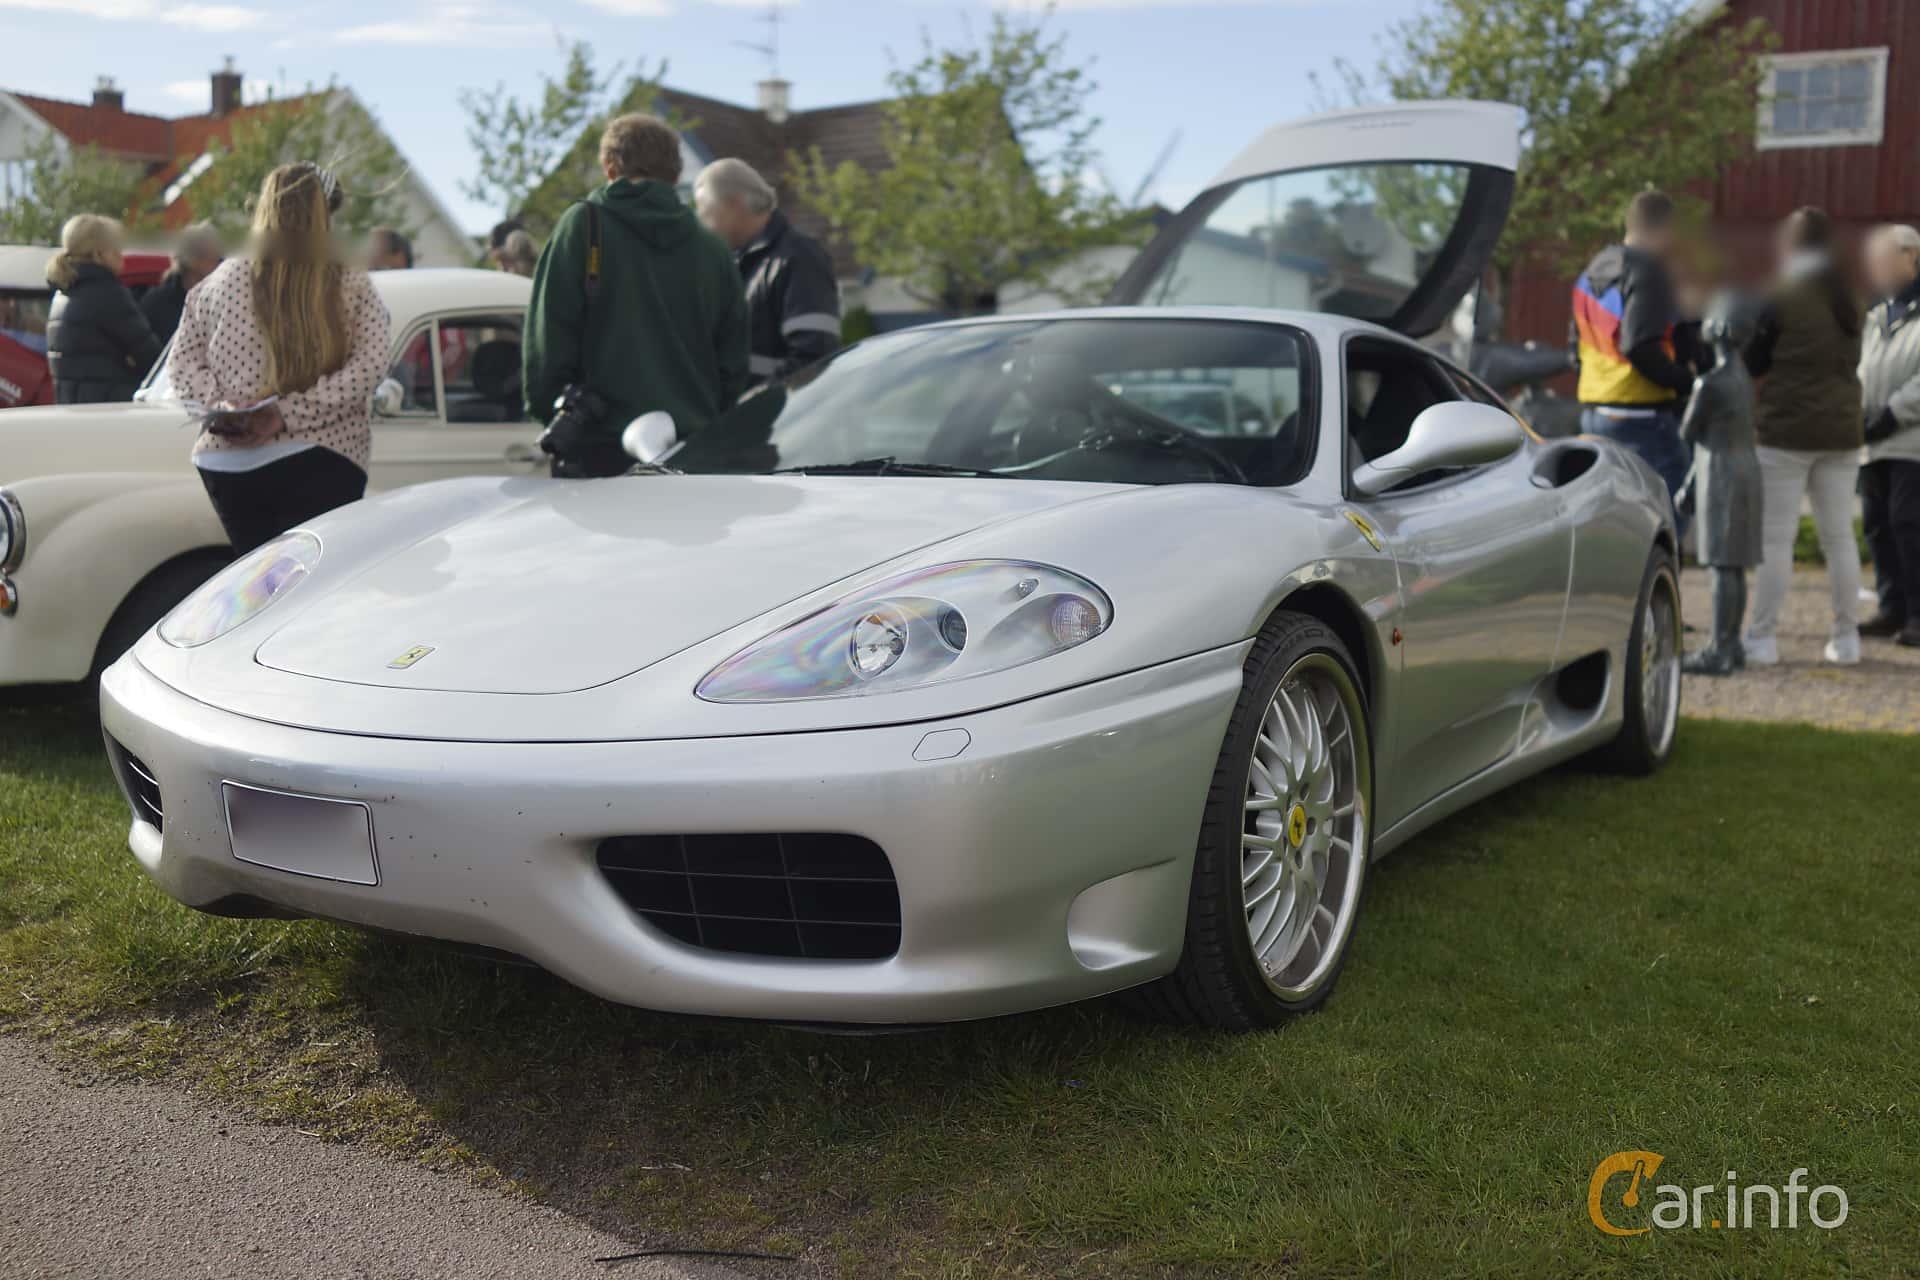 Ferrari 360 Modena 3.6 V8 Sequential, 400hp, 2001 at Veteranbilsträff i Vikens hamn Maj 2015